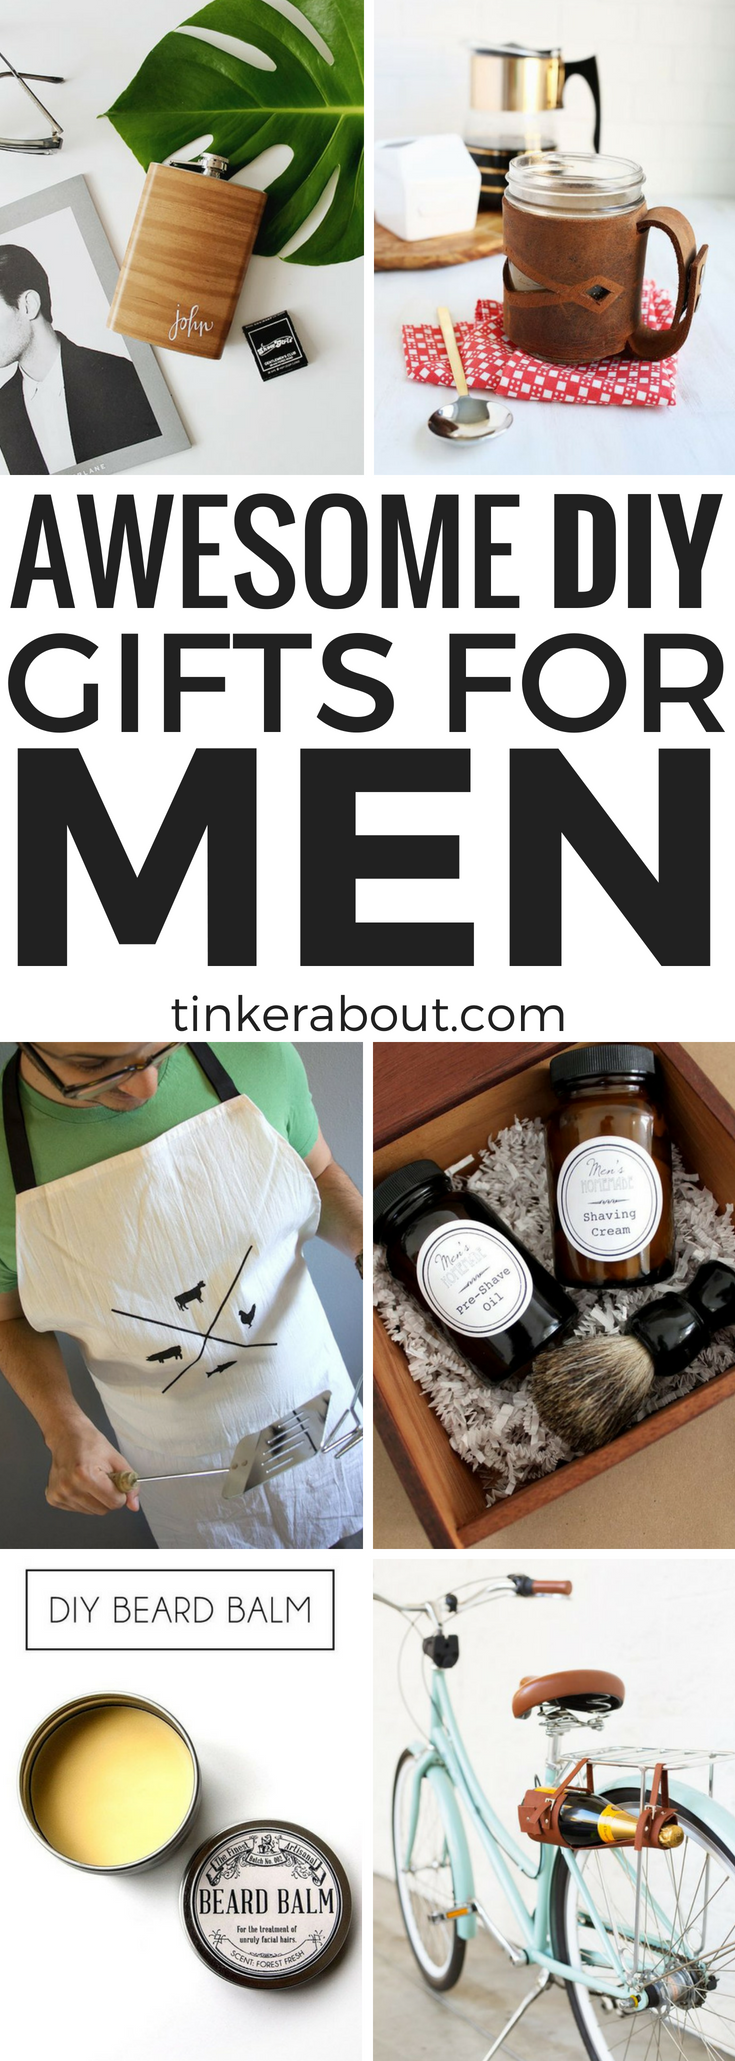 21 Modern Manly Gifts For Boyfriends Perfect For Birthdays Best Boyfriend Gifts Creative Birthday Gifts Birthday Gifts For Husband